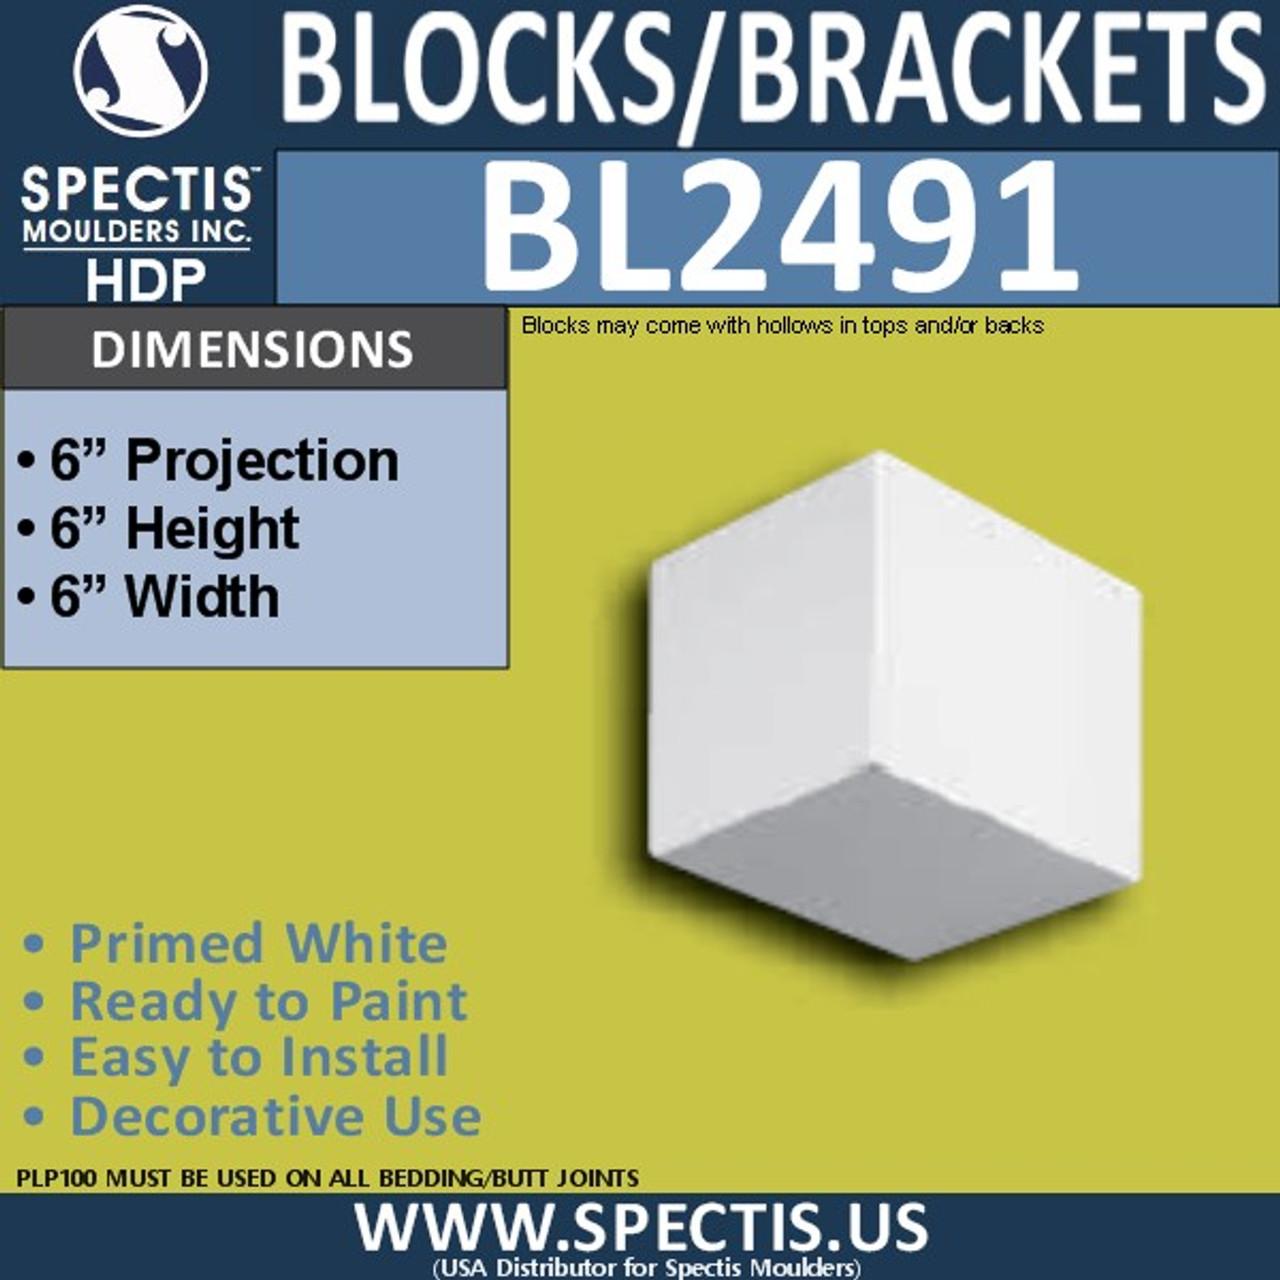 "BL2491 Eave Block or Bracket 6""W x 6""H x 6"" P"